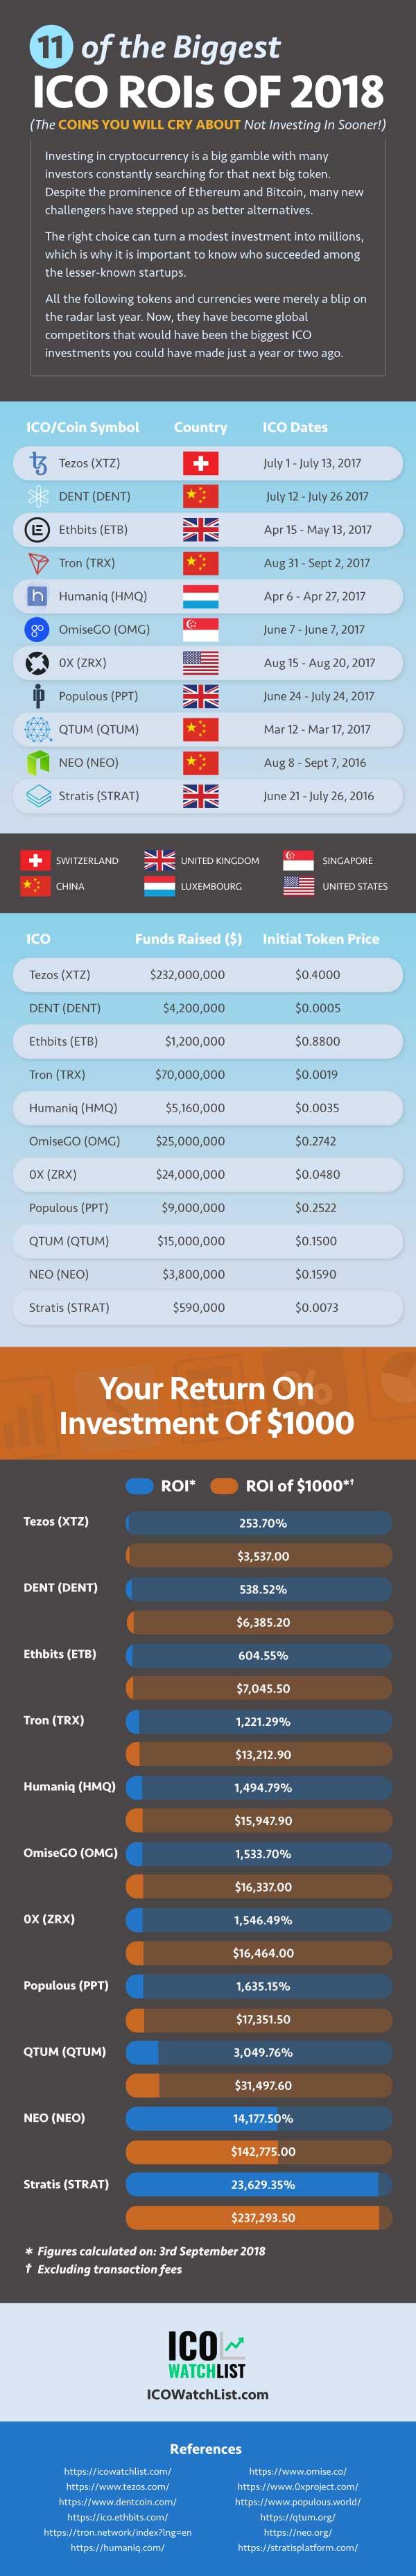 Infographic 2018'S BIGGEST ICO ROIs